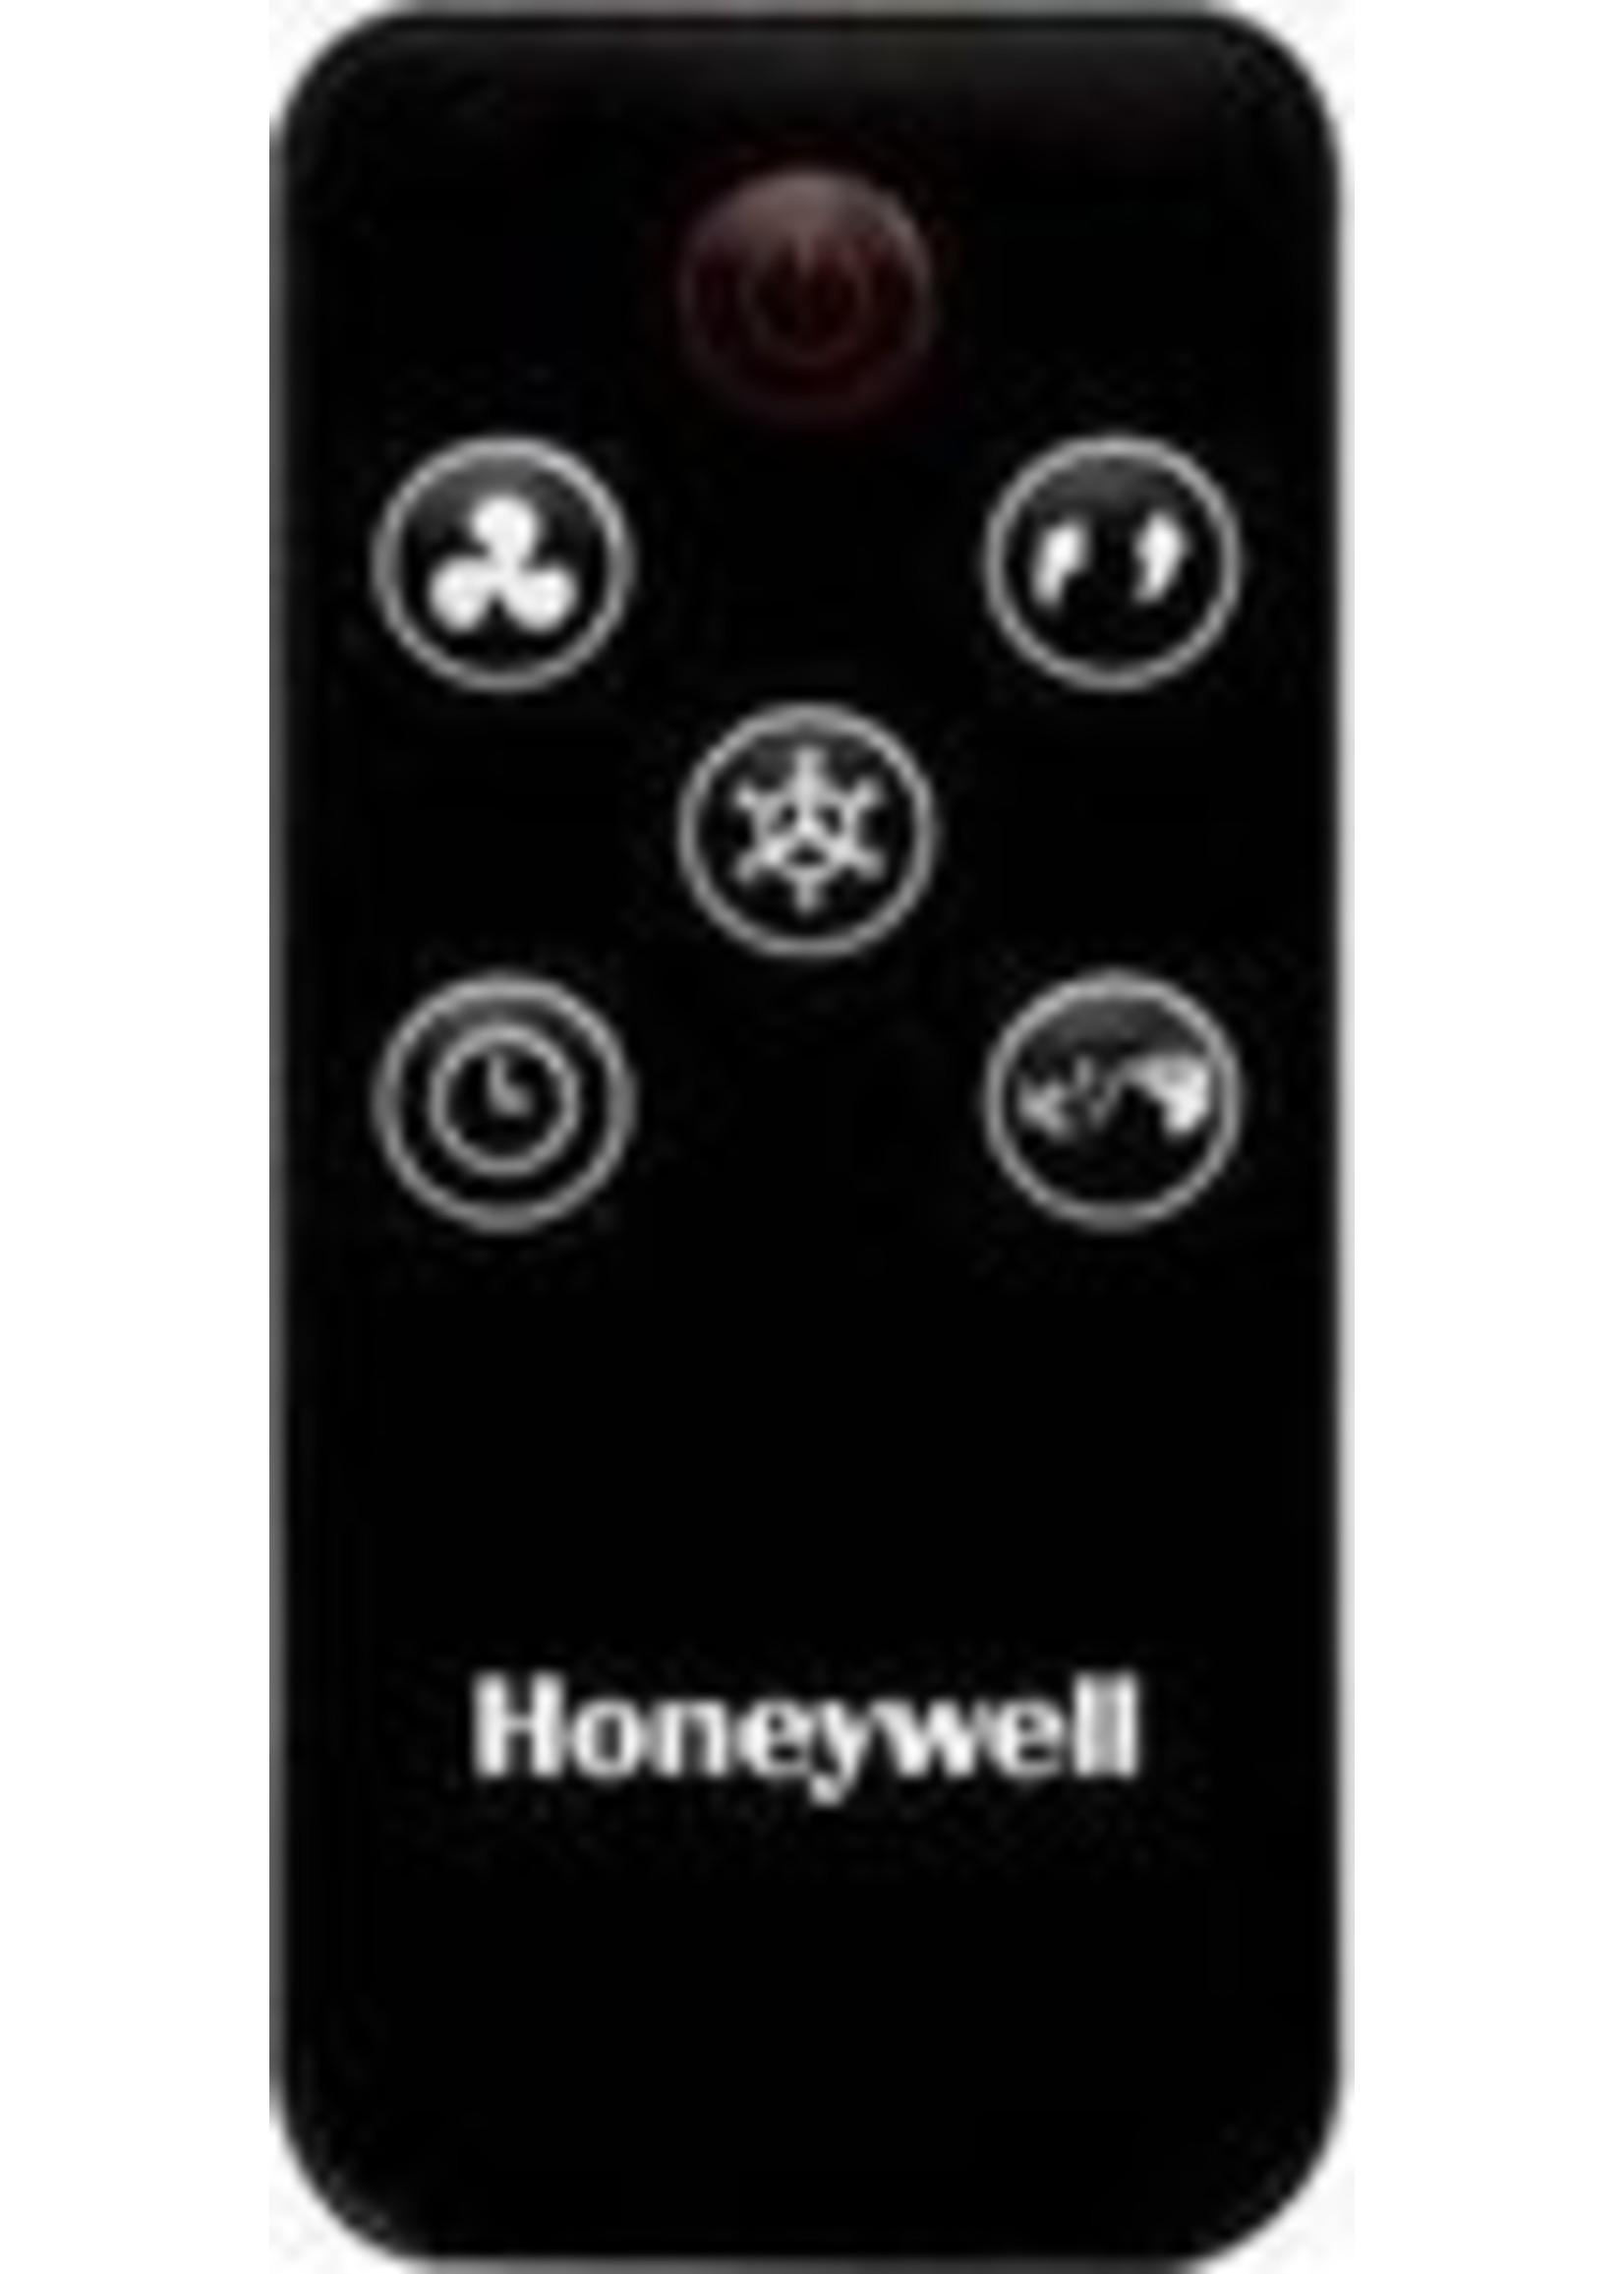 Honeywell Honeywell AIDC ES800 - Luchtkoeler